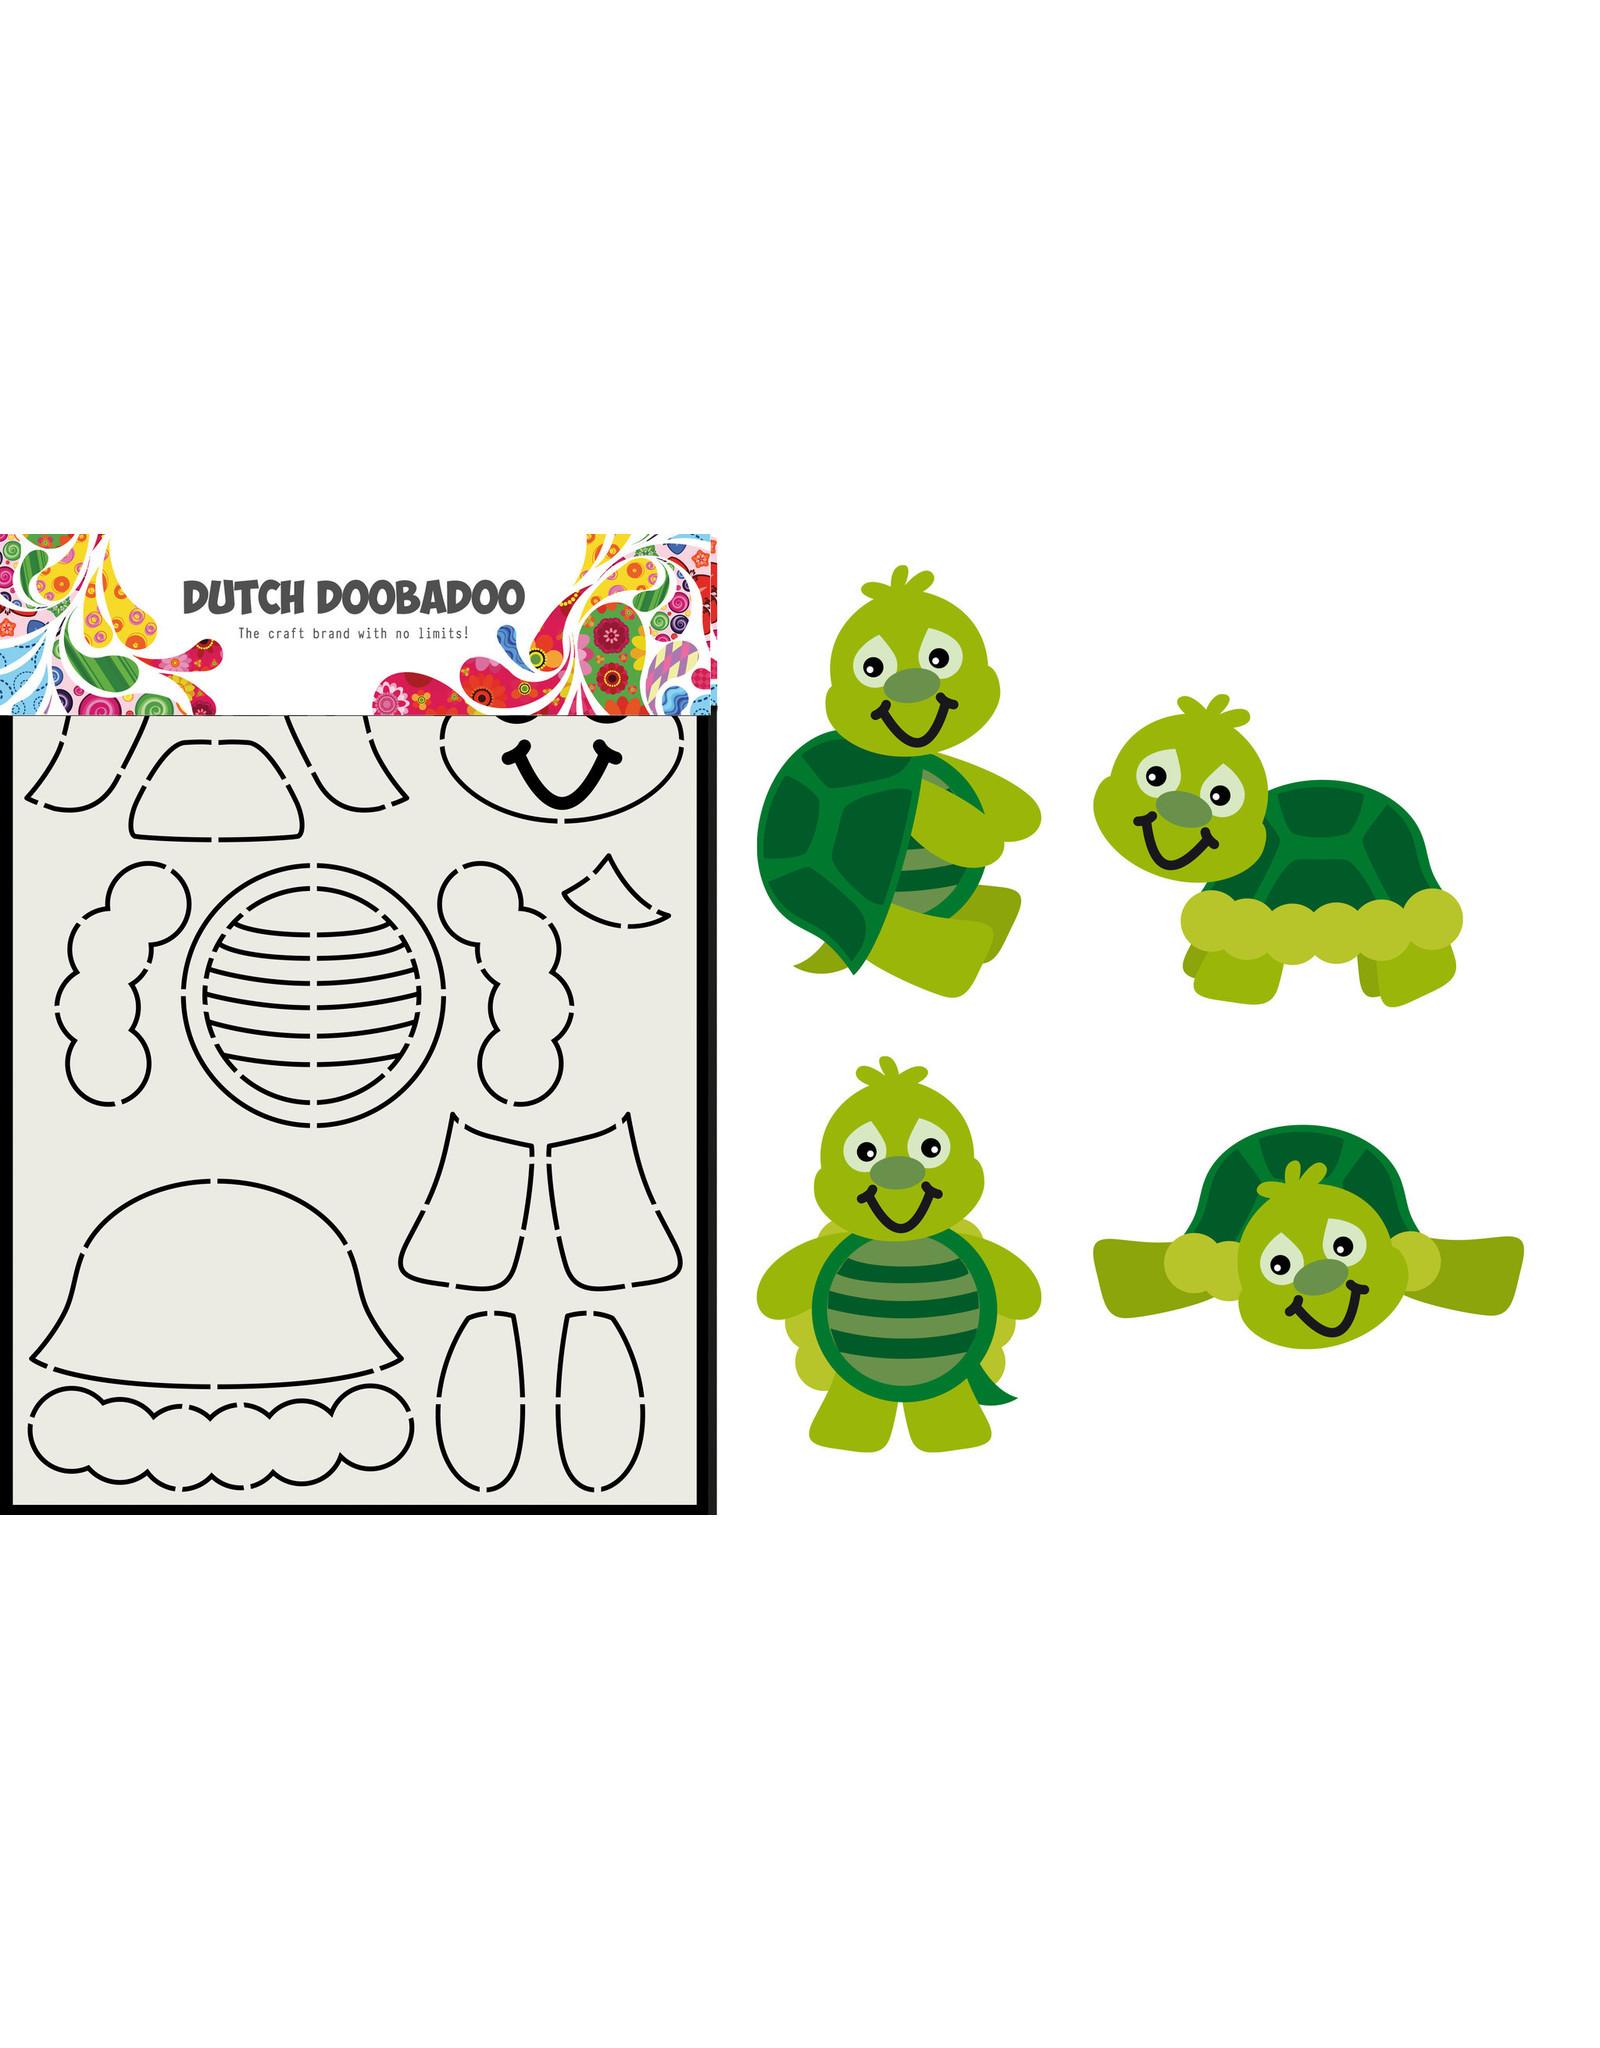 Dutch Doobadoo DDBD Card Art Build up Schildpad A5